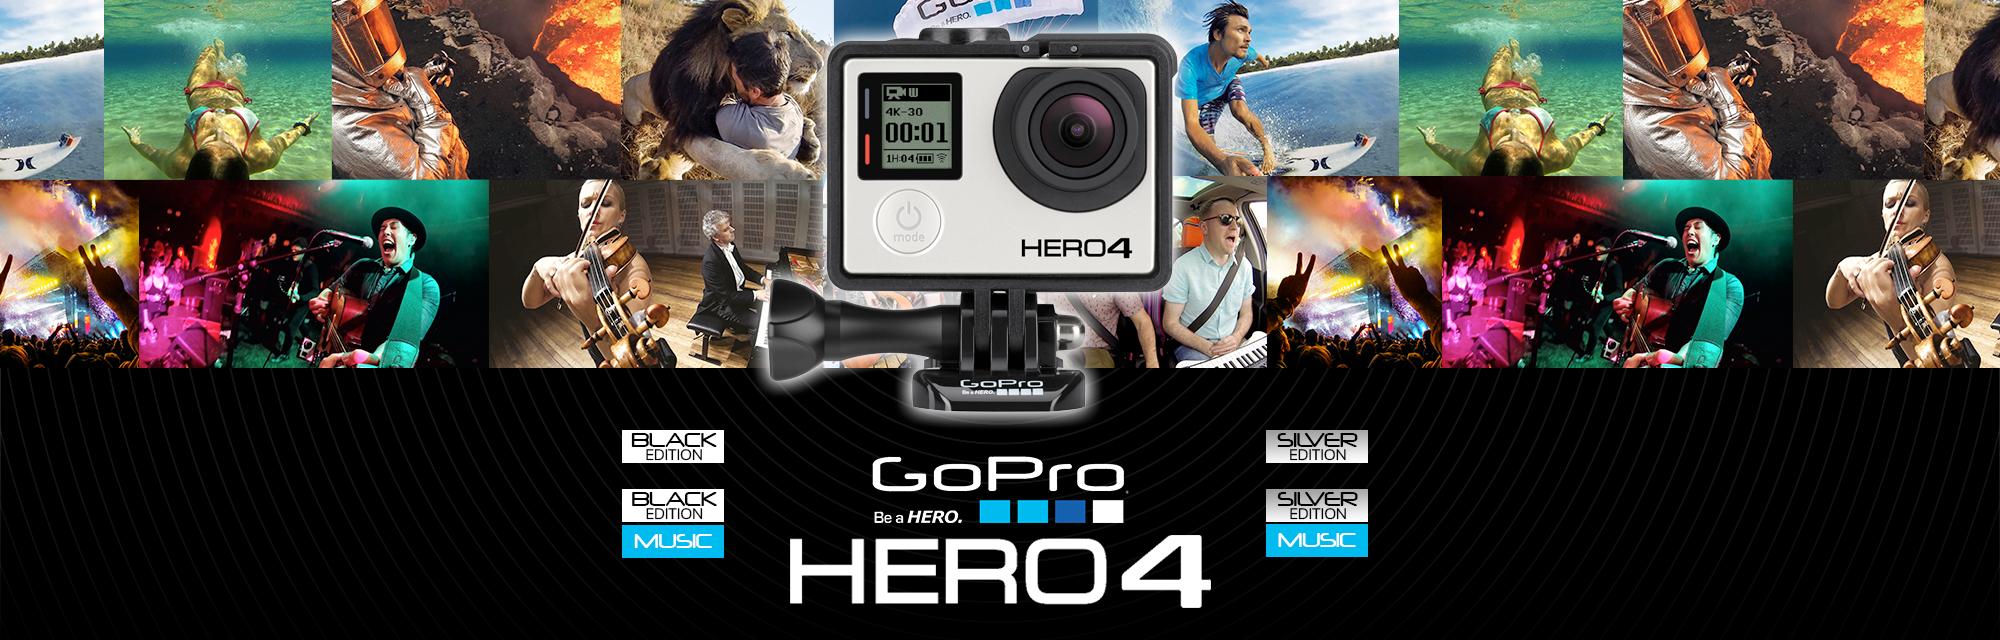 GoPro Hero4 Series